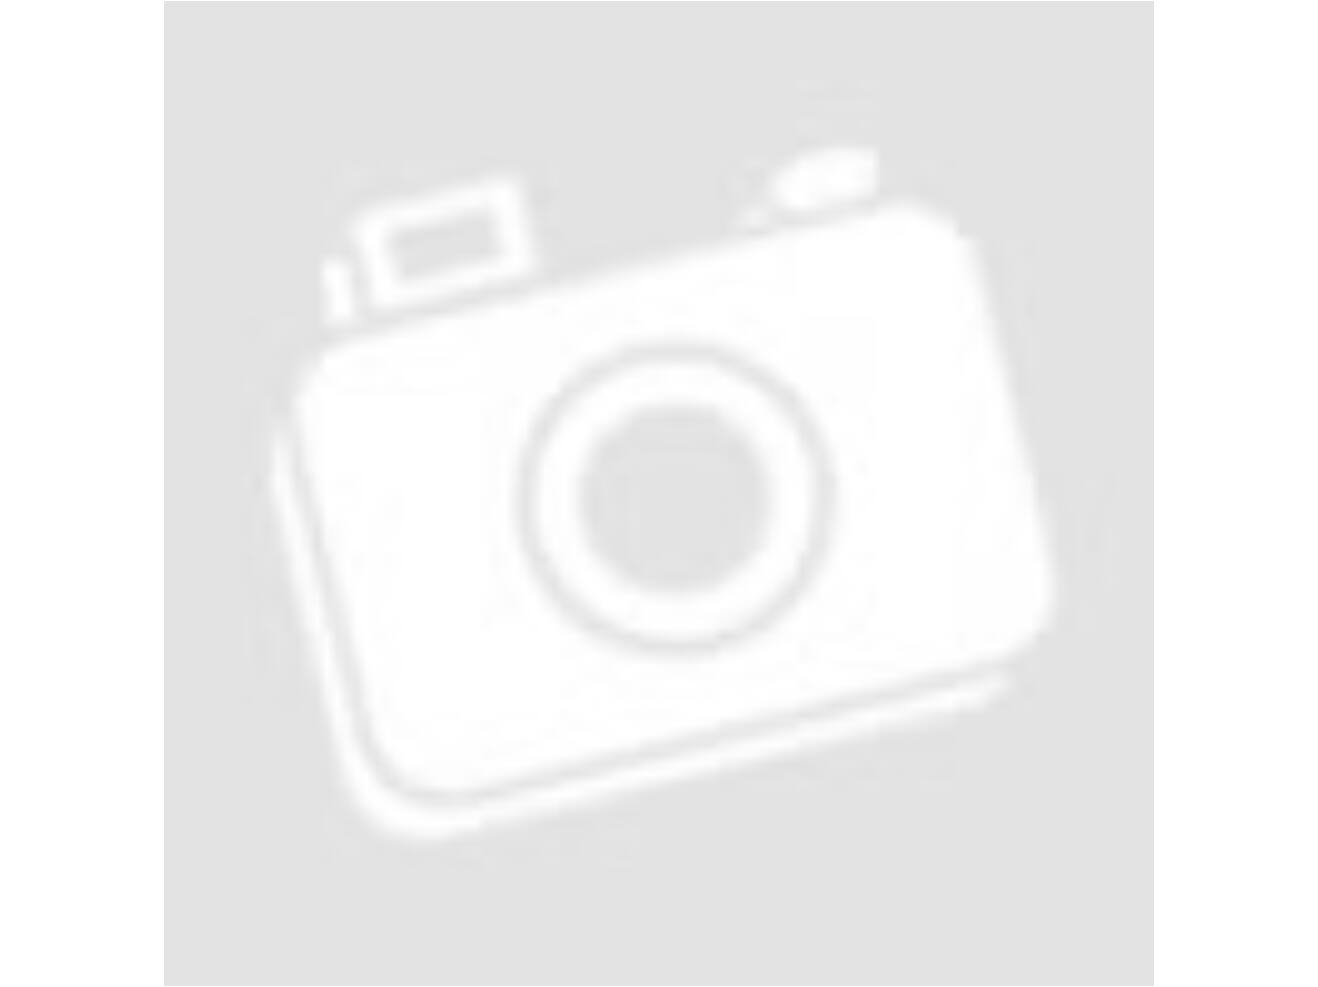 NIKE MAGISTA OBRA II ELITE FG - FG AG (Műanyag stoplis) -  Alexandersoccershoes 48896ed965